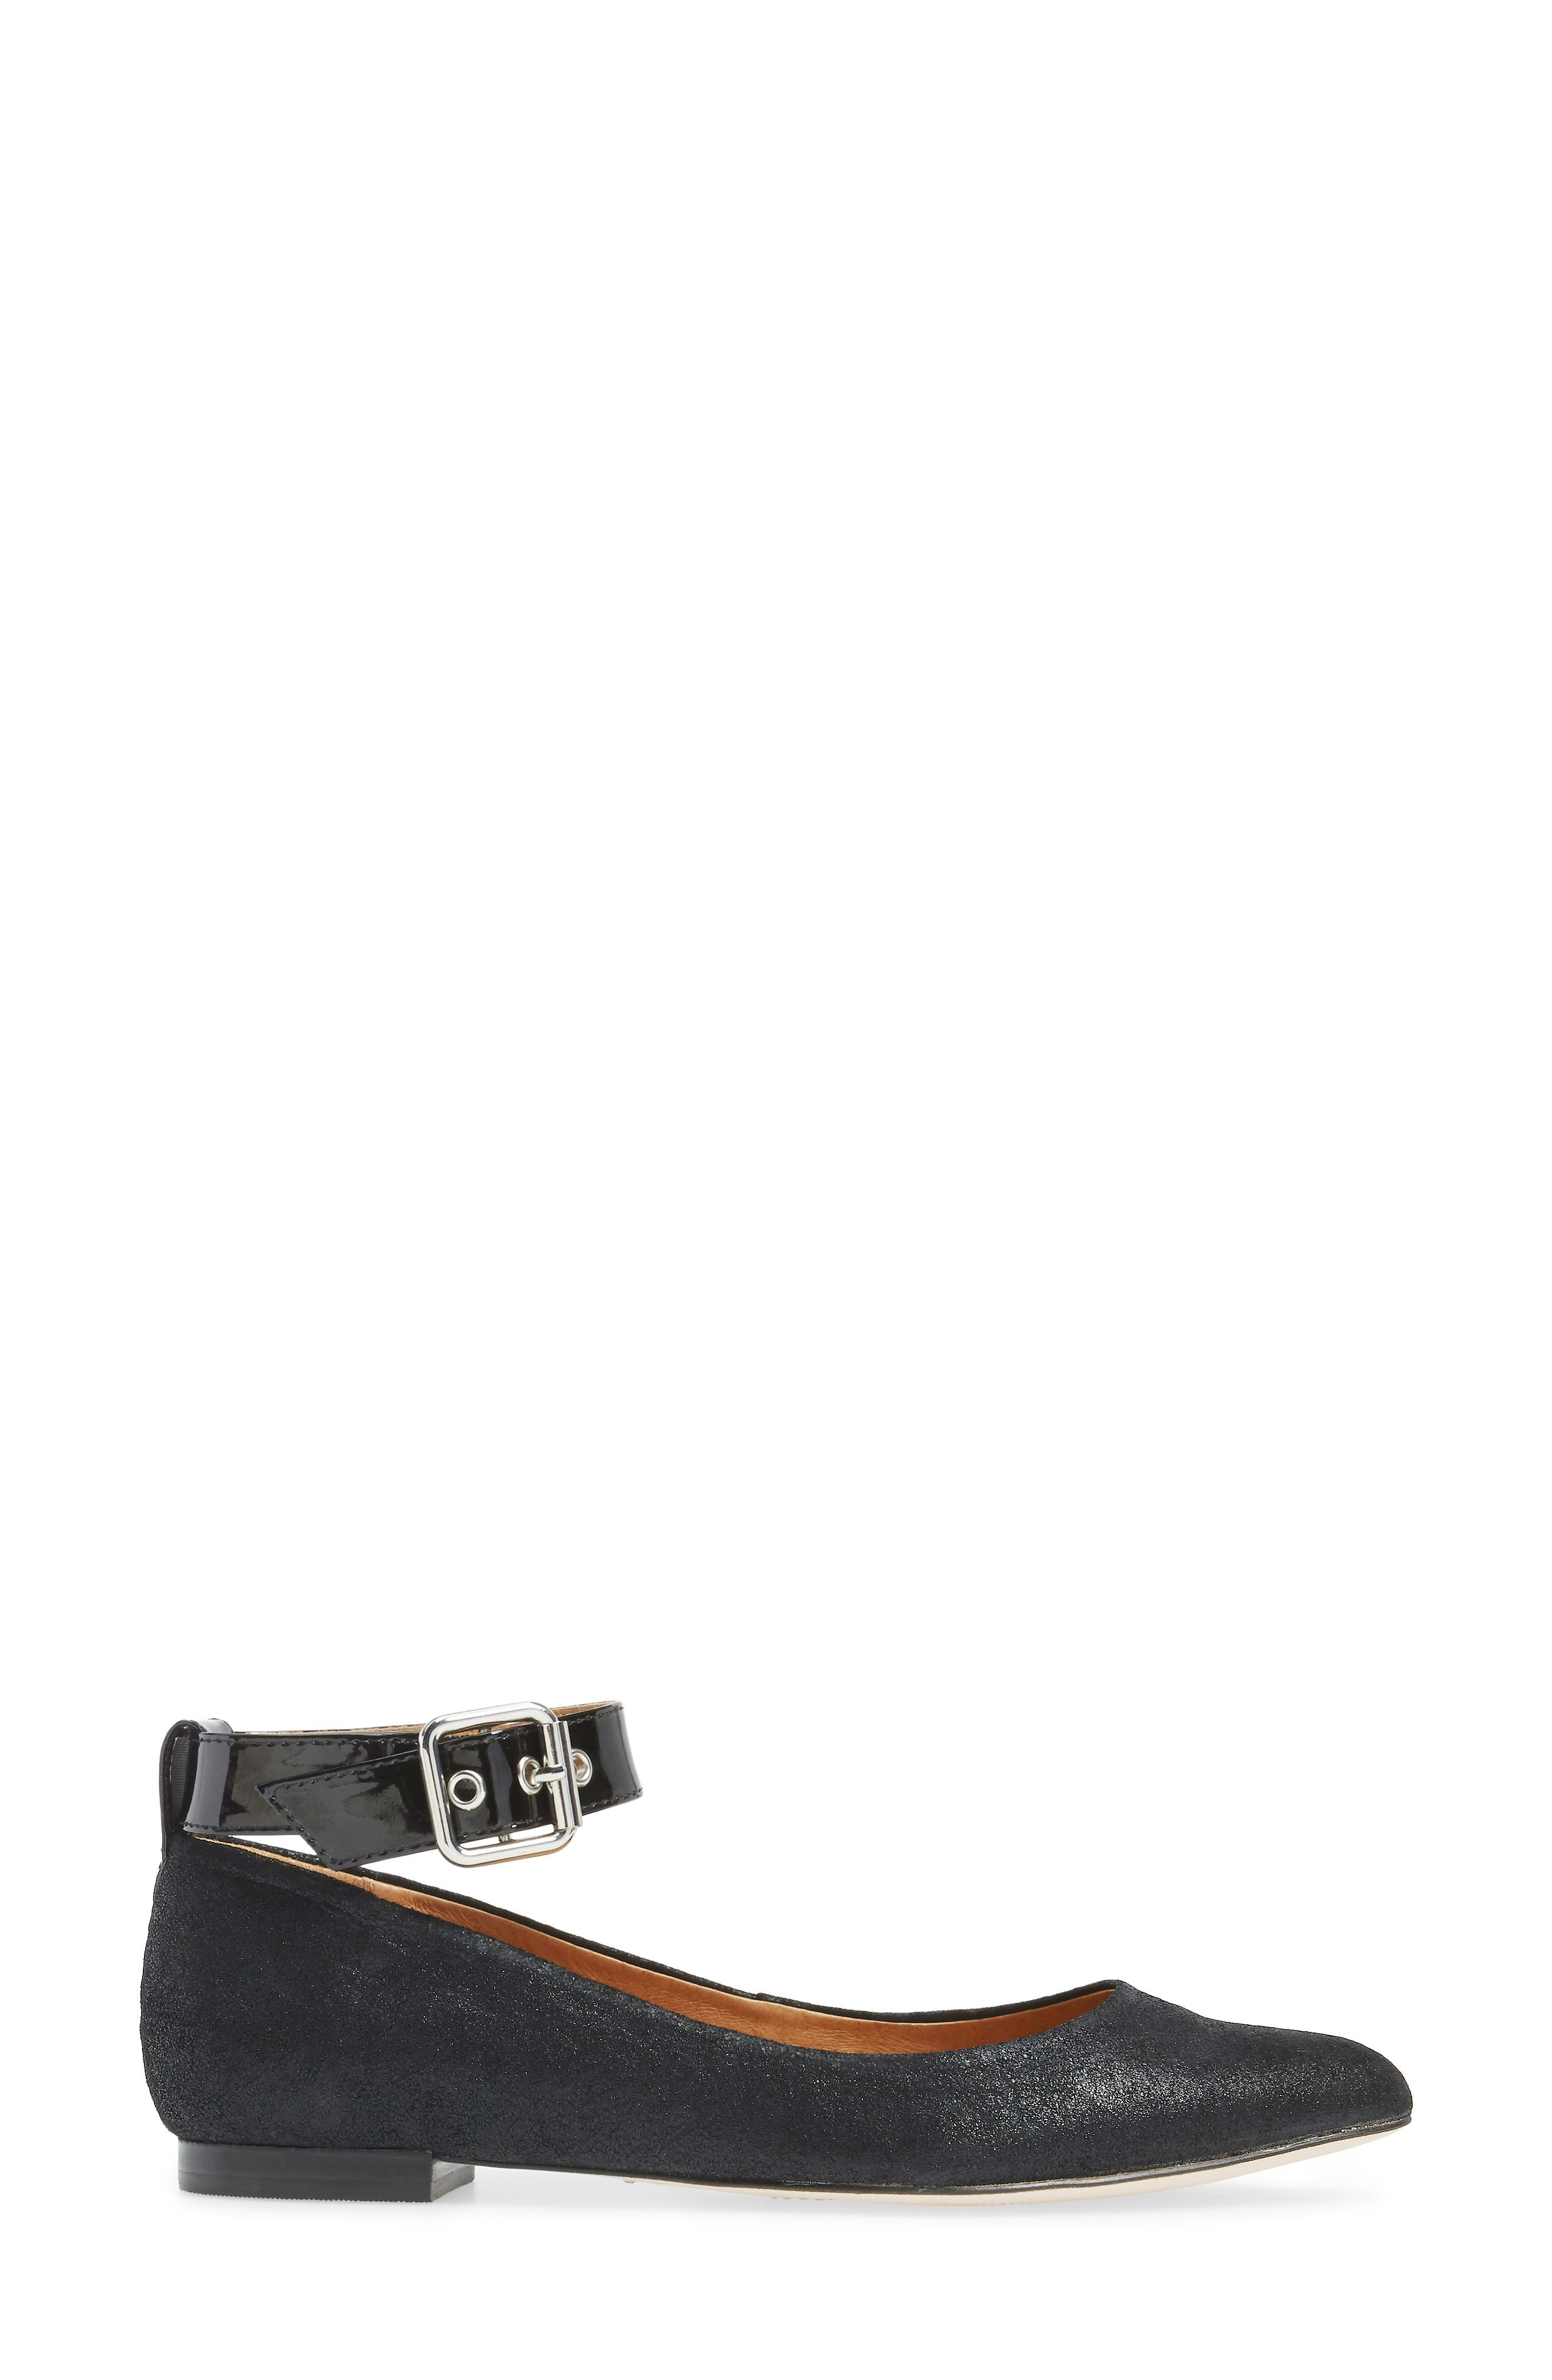 Alternate Image 3  - Corso Como Ramona Ankle Strap Flat (Women)